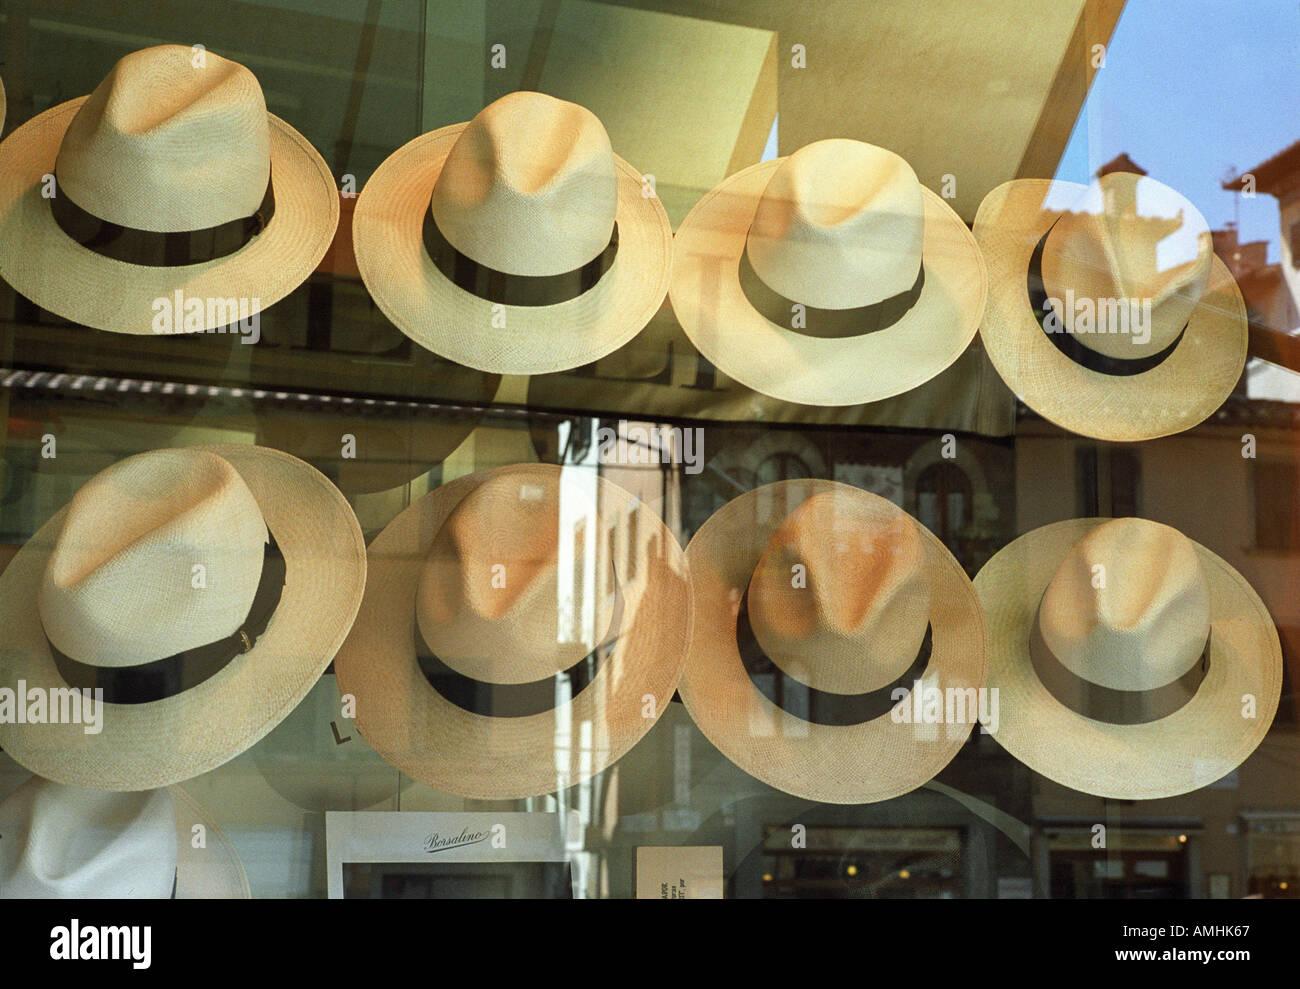 b55bc74f panama hats in shop window Cortona Italy Stock Photo: 4984678 - Alamy